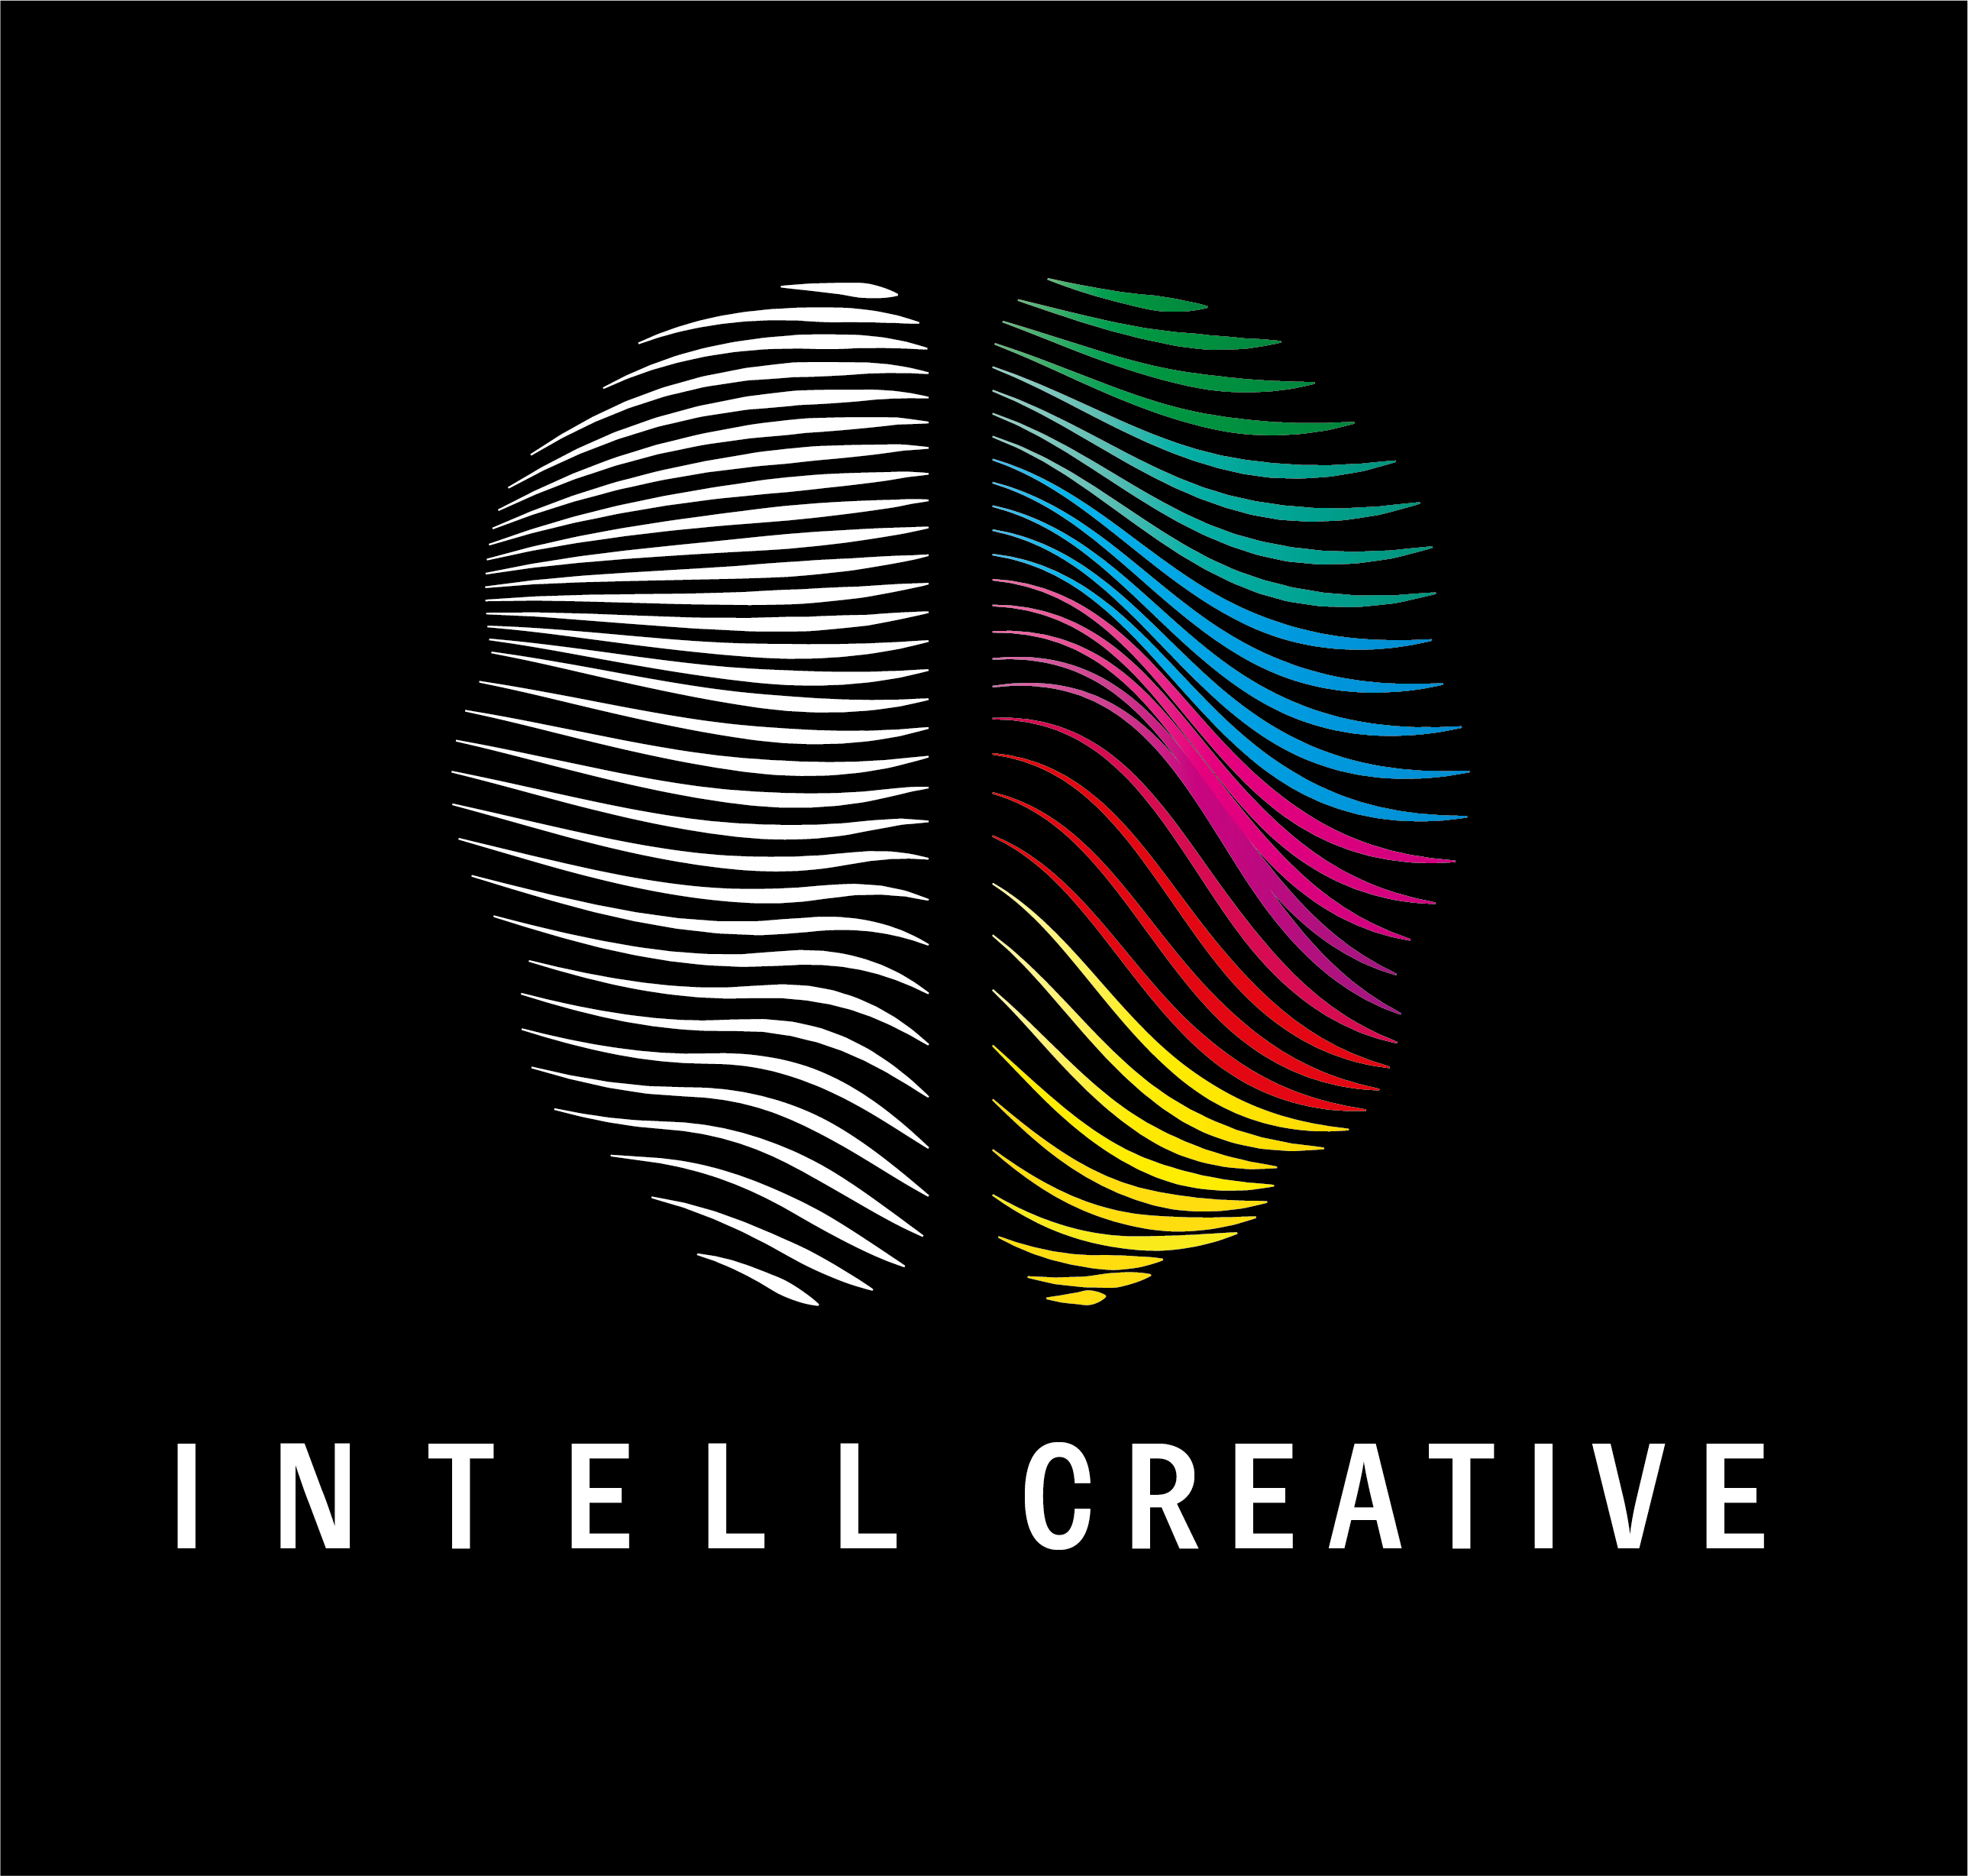 IntellCreative